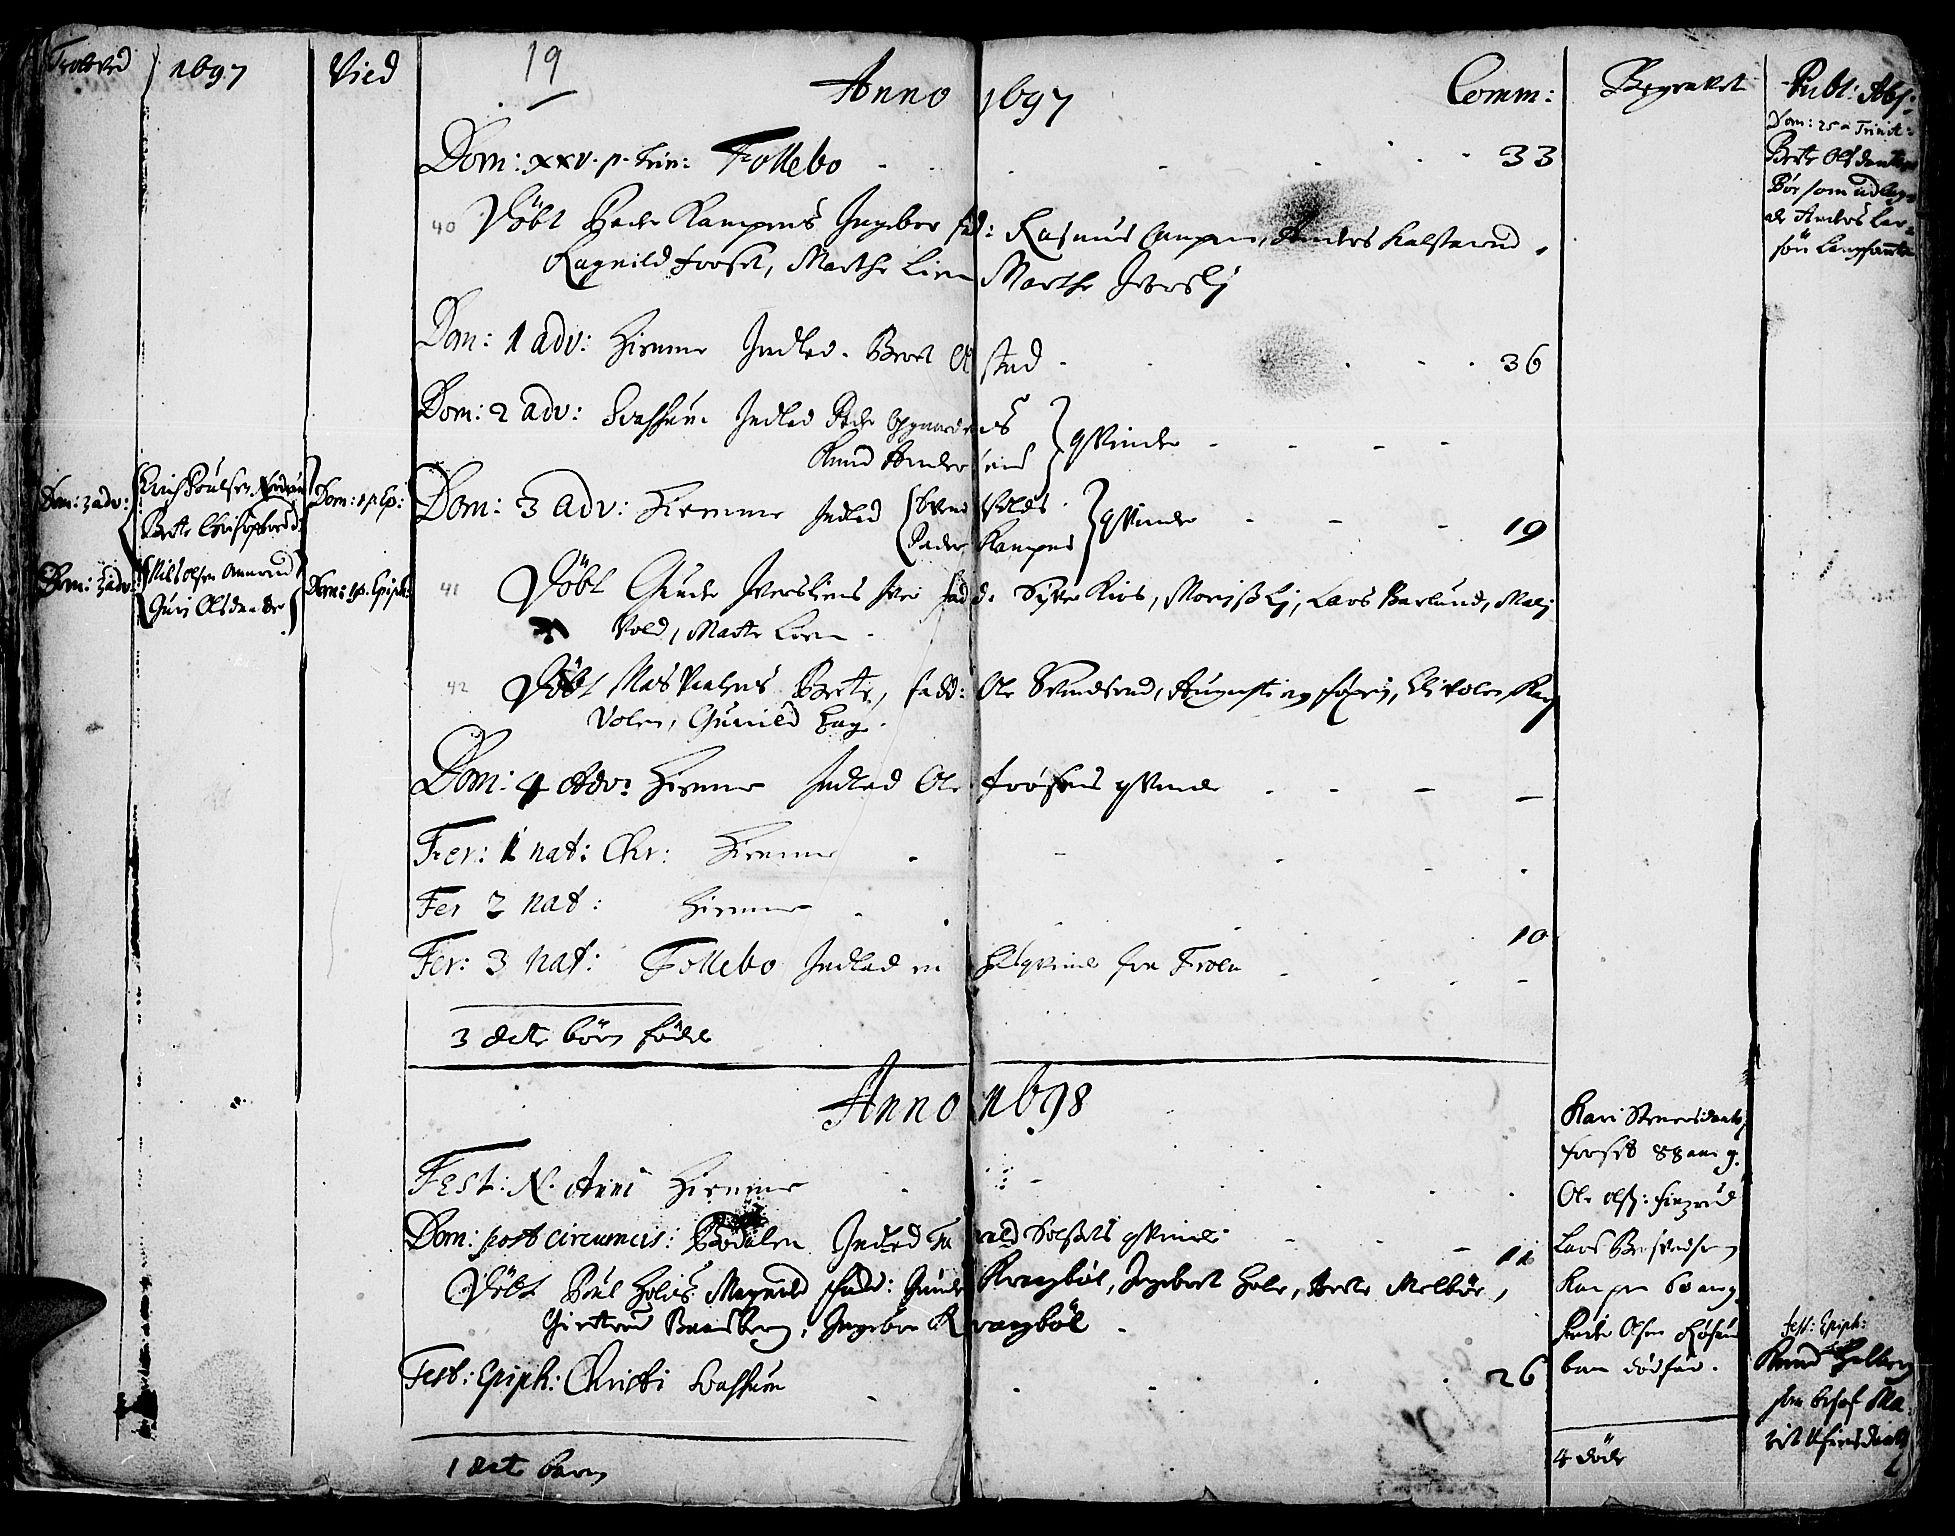 SAH, Gausdal prestekontor, Ministerialbok nr. 1, 1693-1728, s. 19